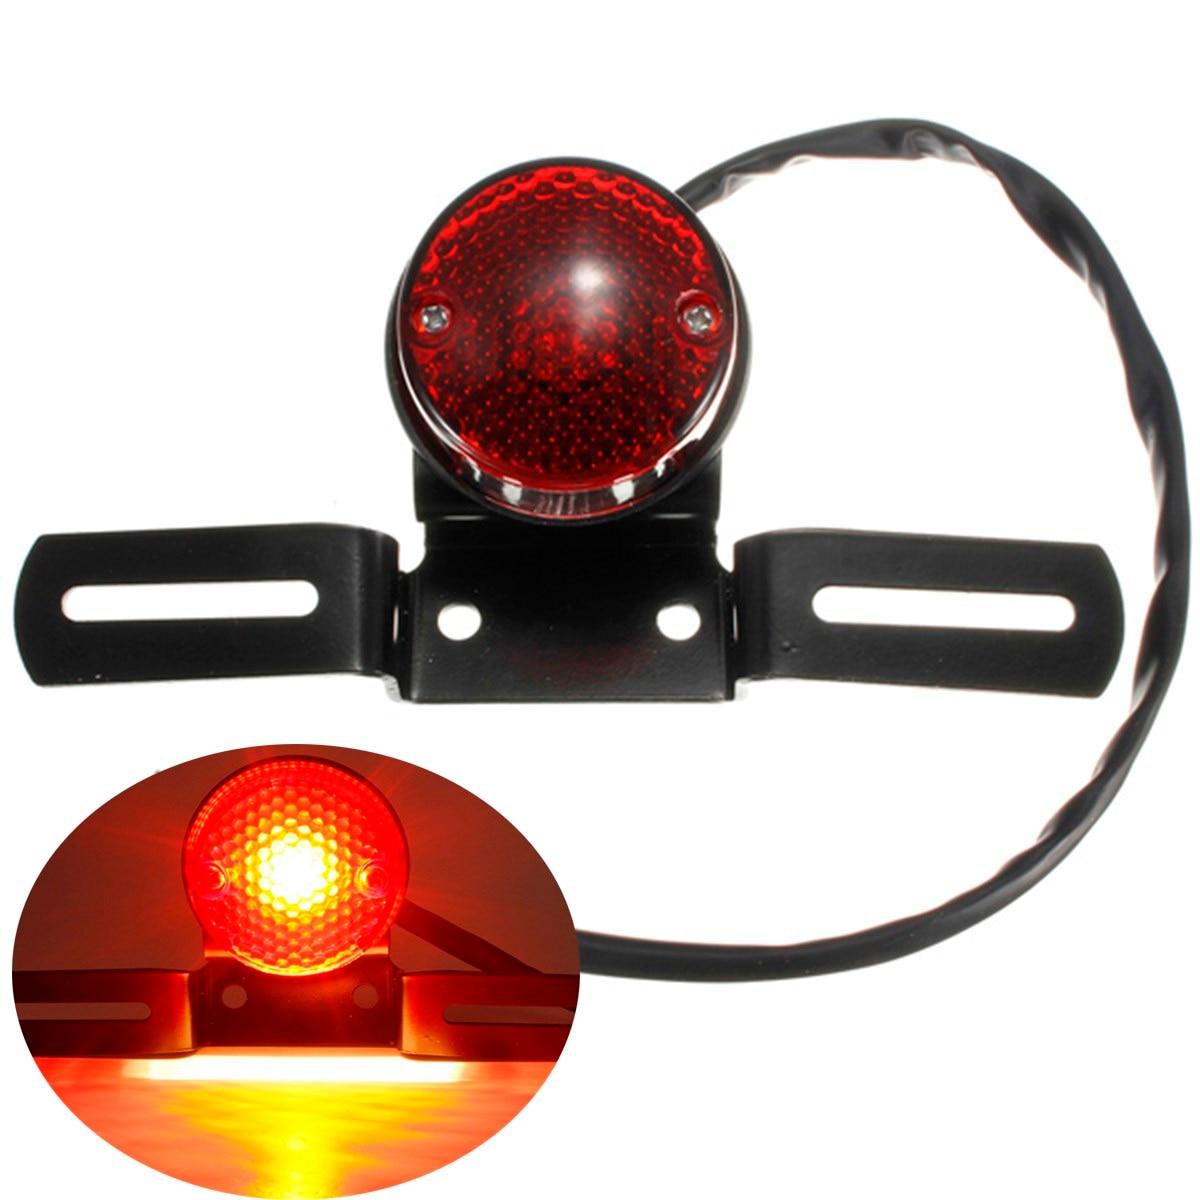 Motocicleta bicicleta trasero Freno de cola Placa de luz para Harley chopper/Bobber